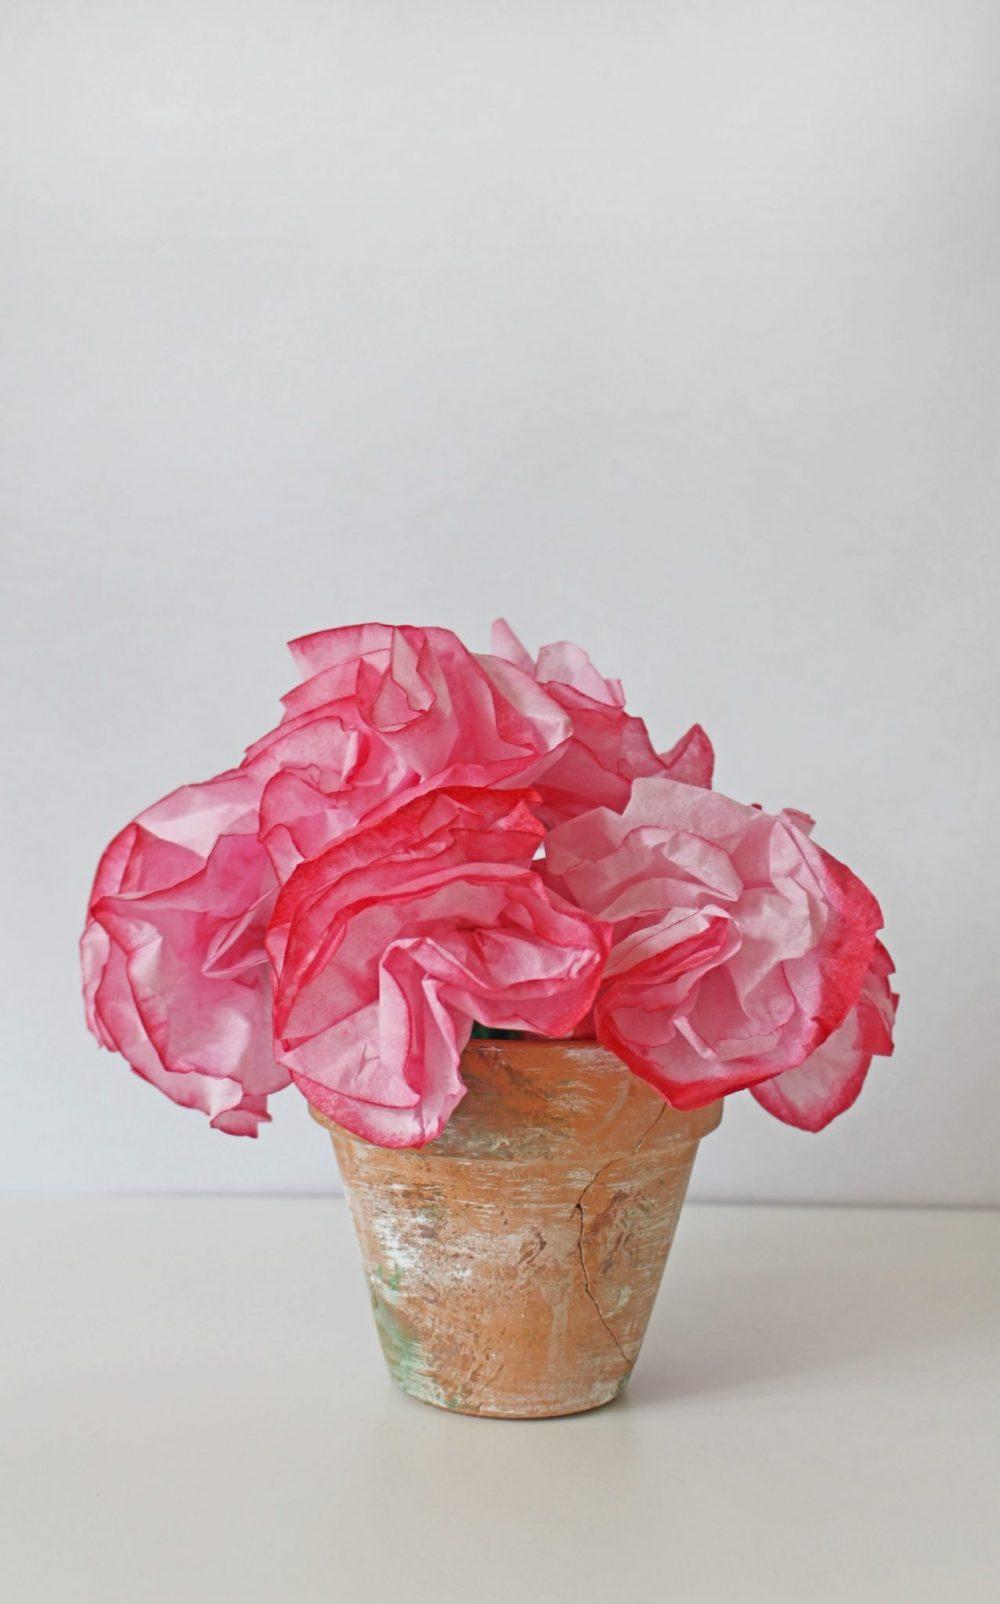 Bouquet of coffee filter flowers in a terracotta flower pot